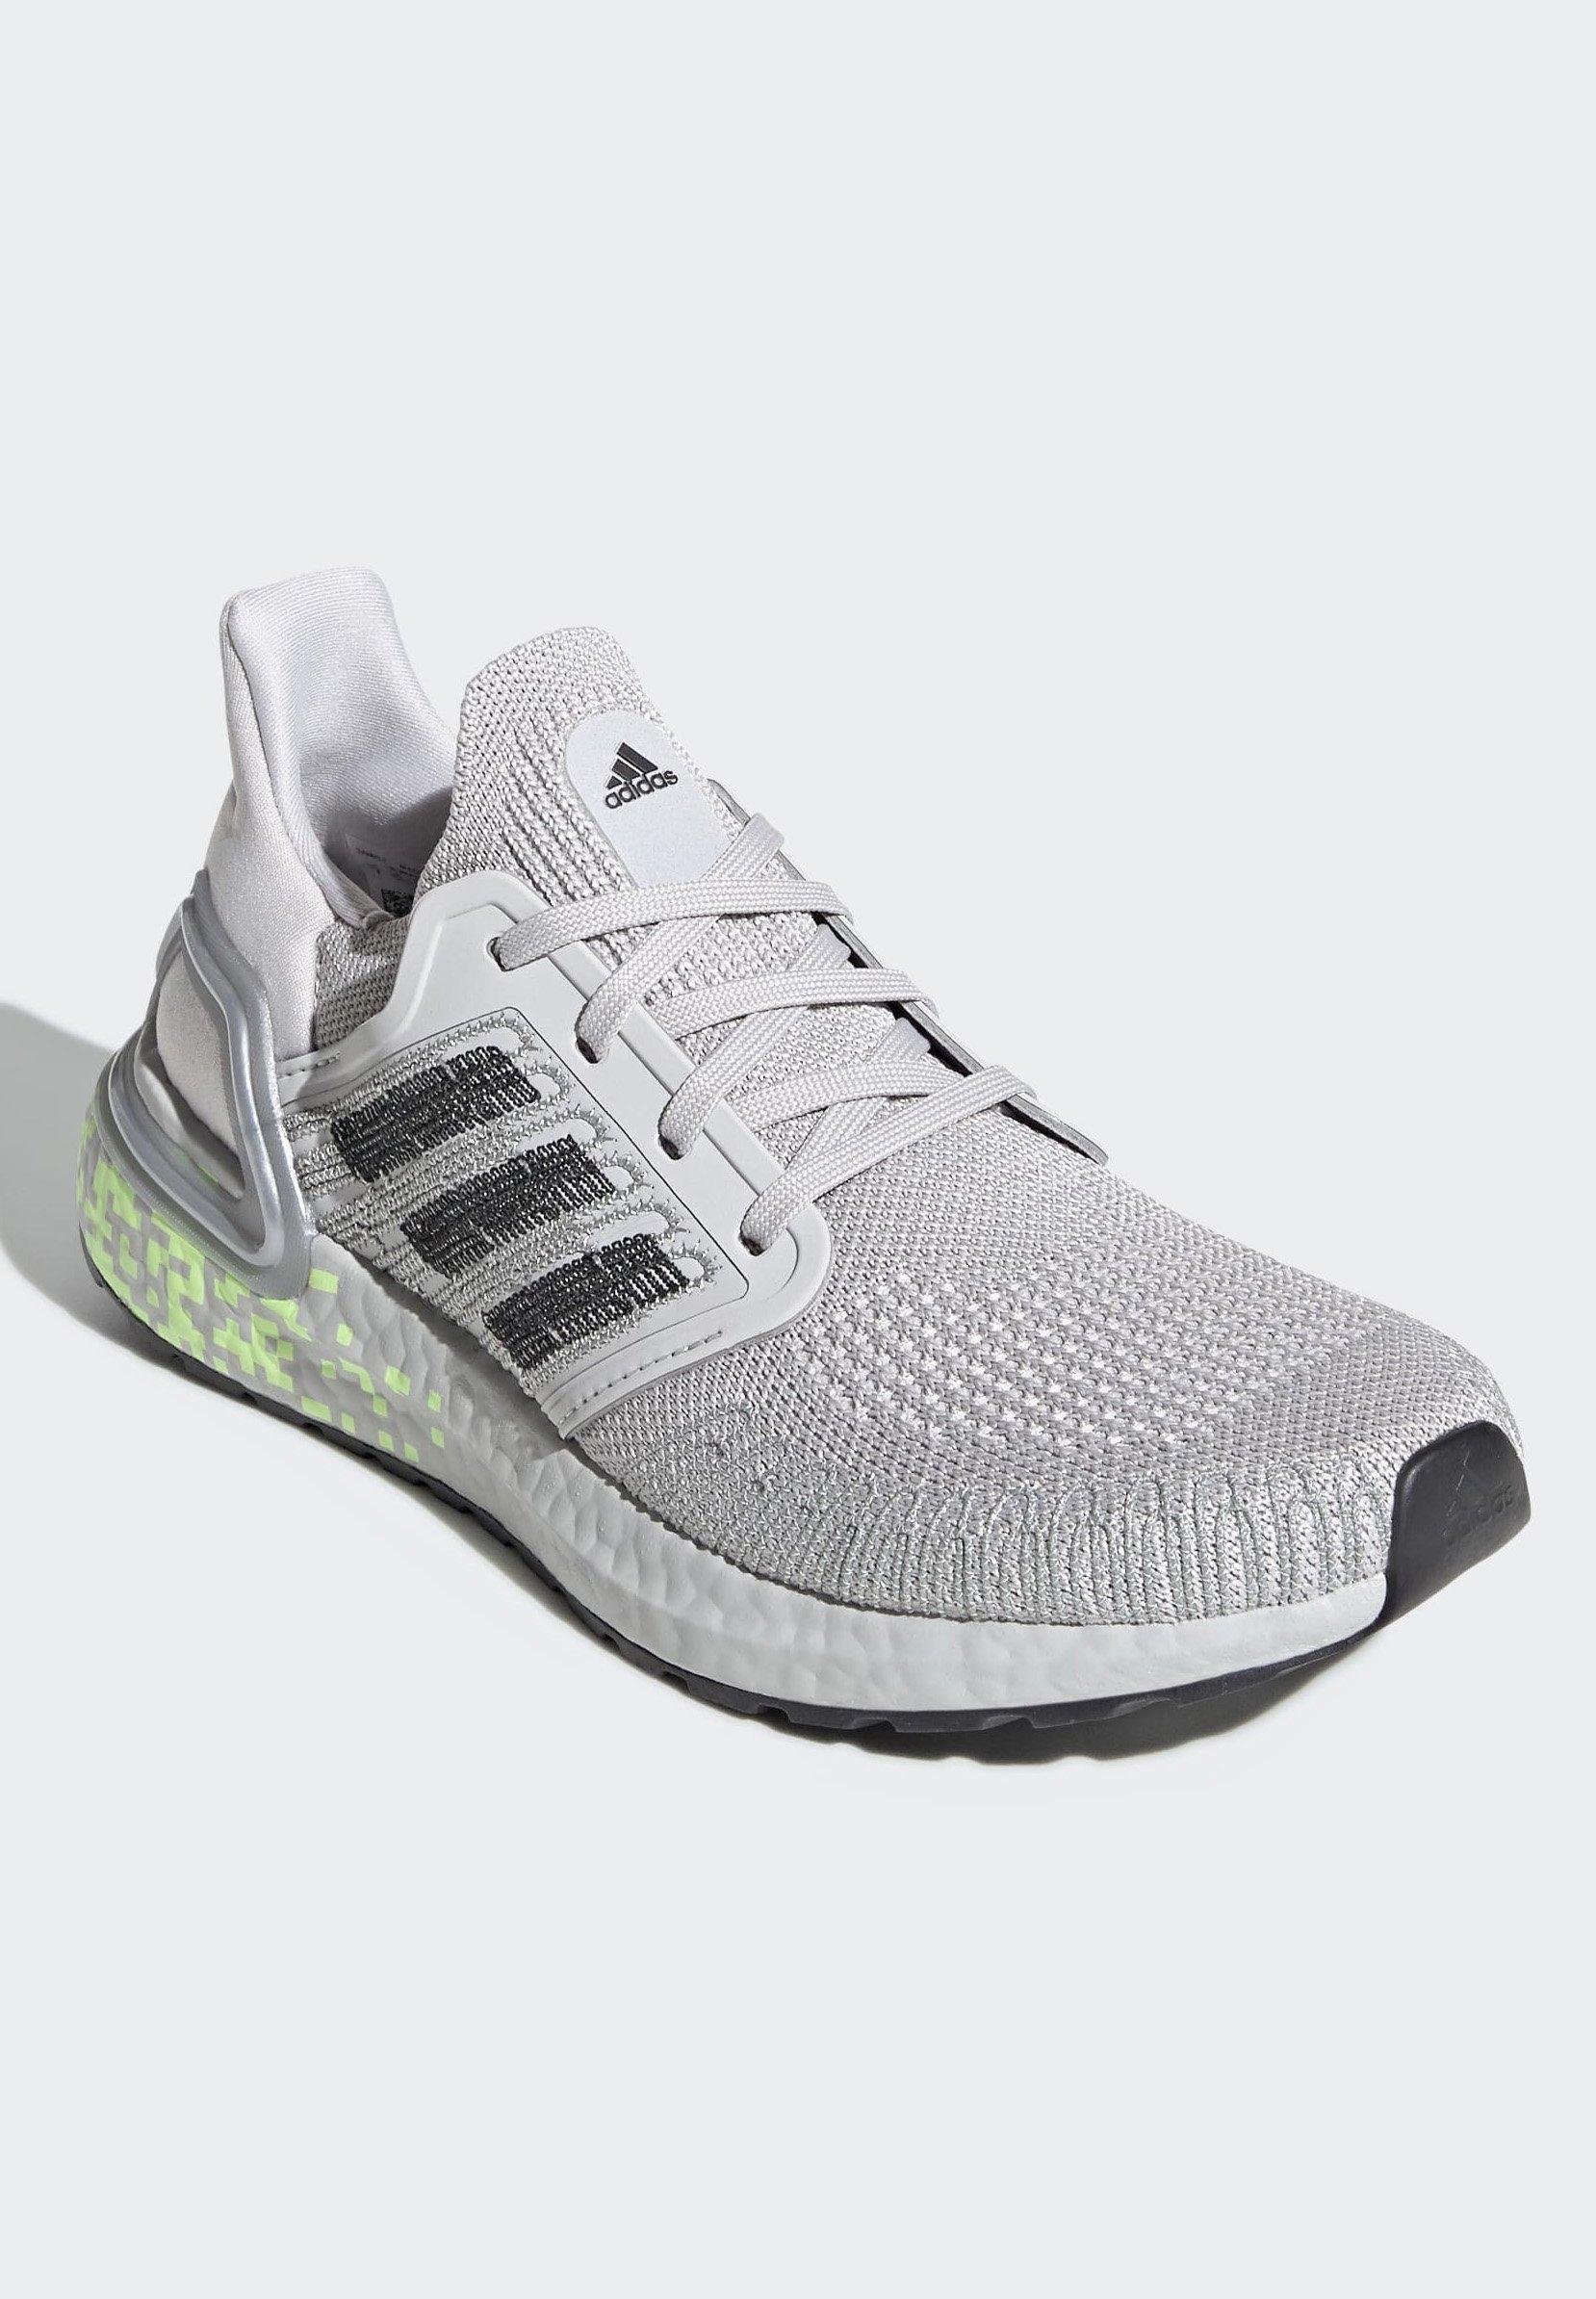 Adidas Performance Ultraboost 20 Shoes - Hardloopschoenen Neutraal Grey Goedkope Schoenen